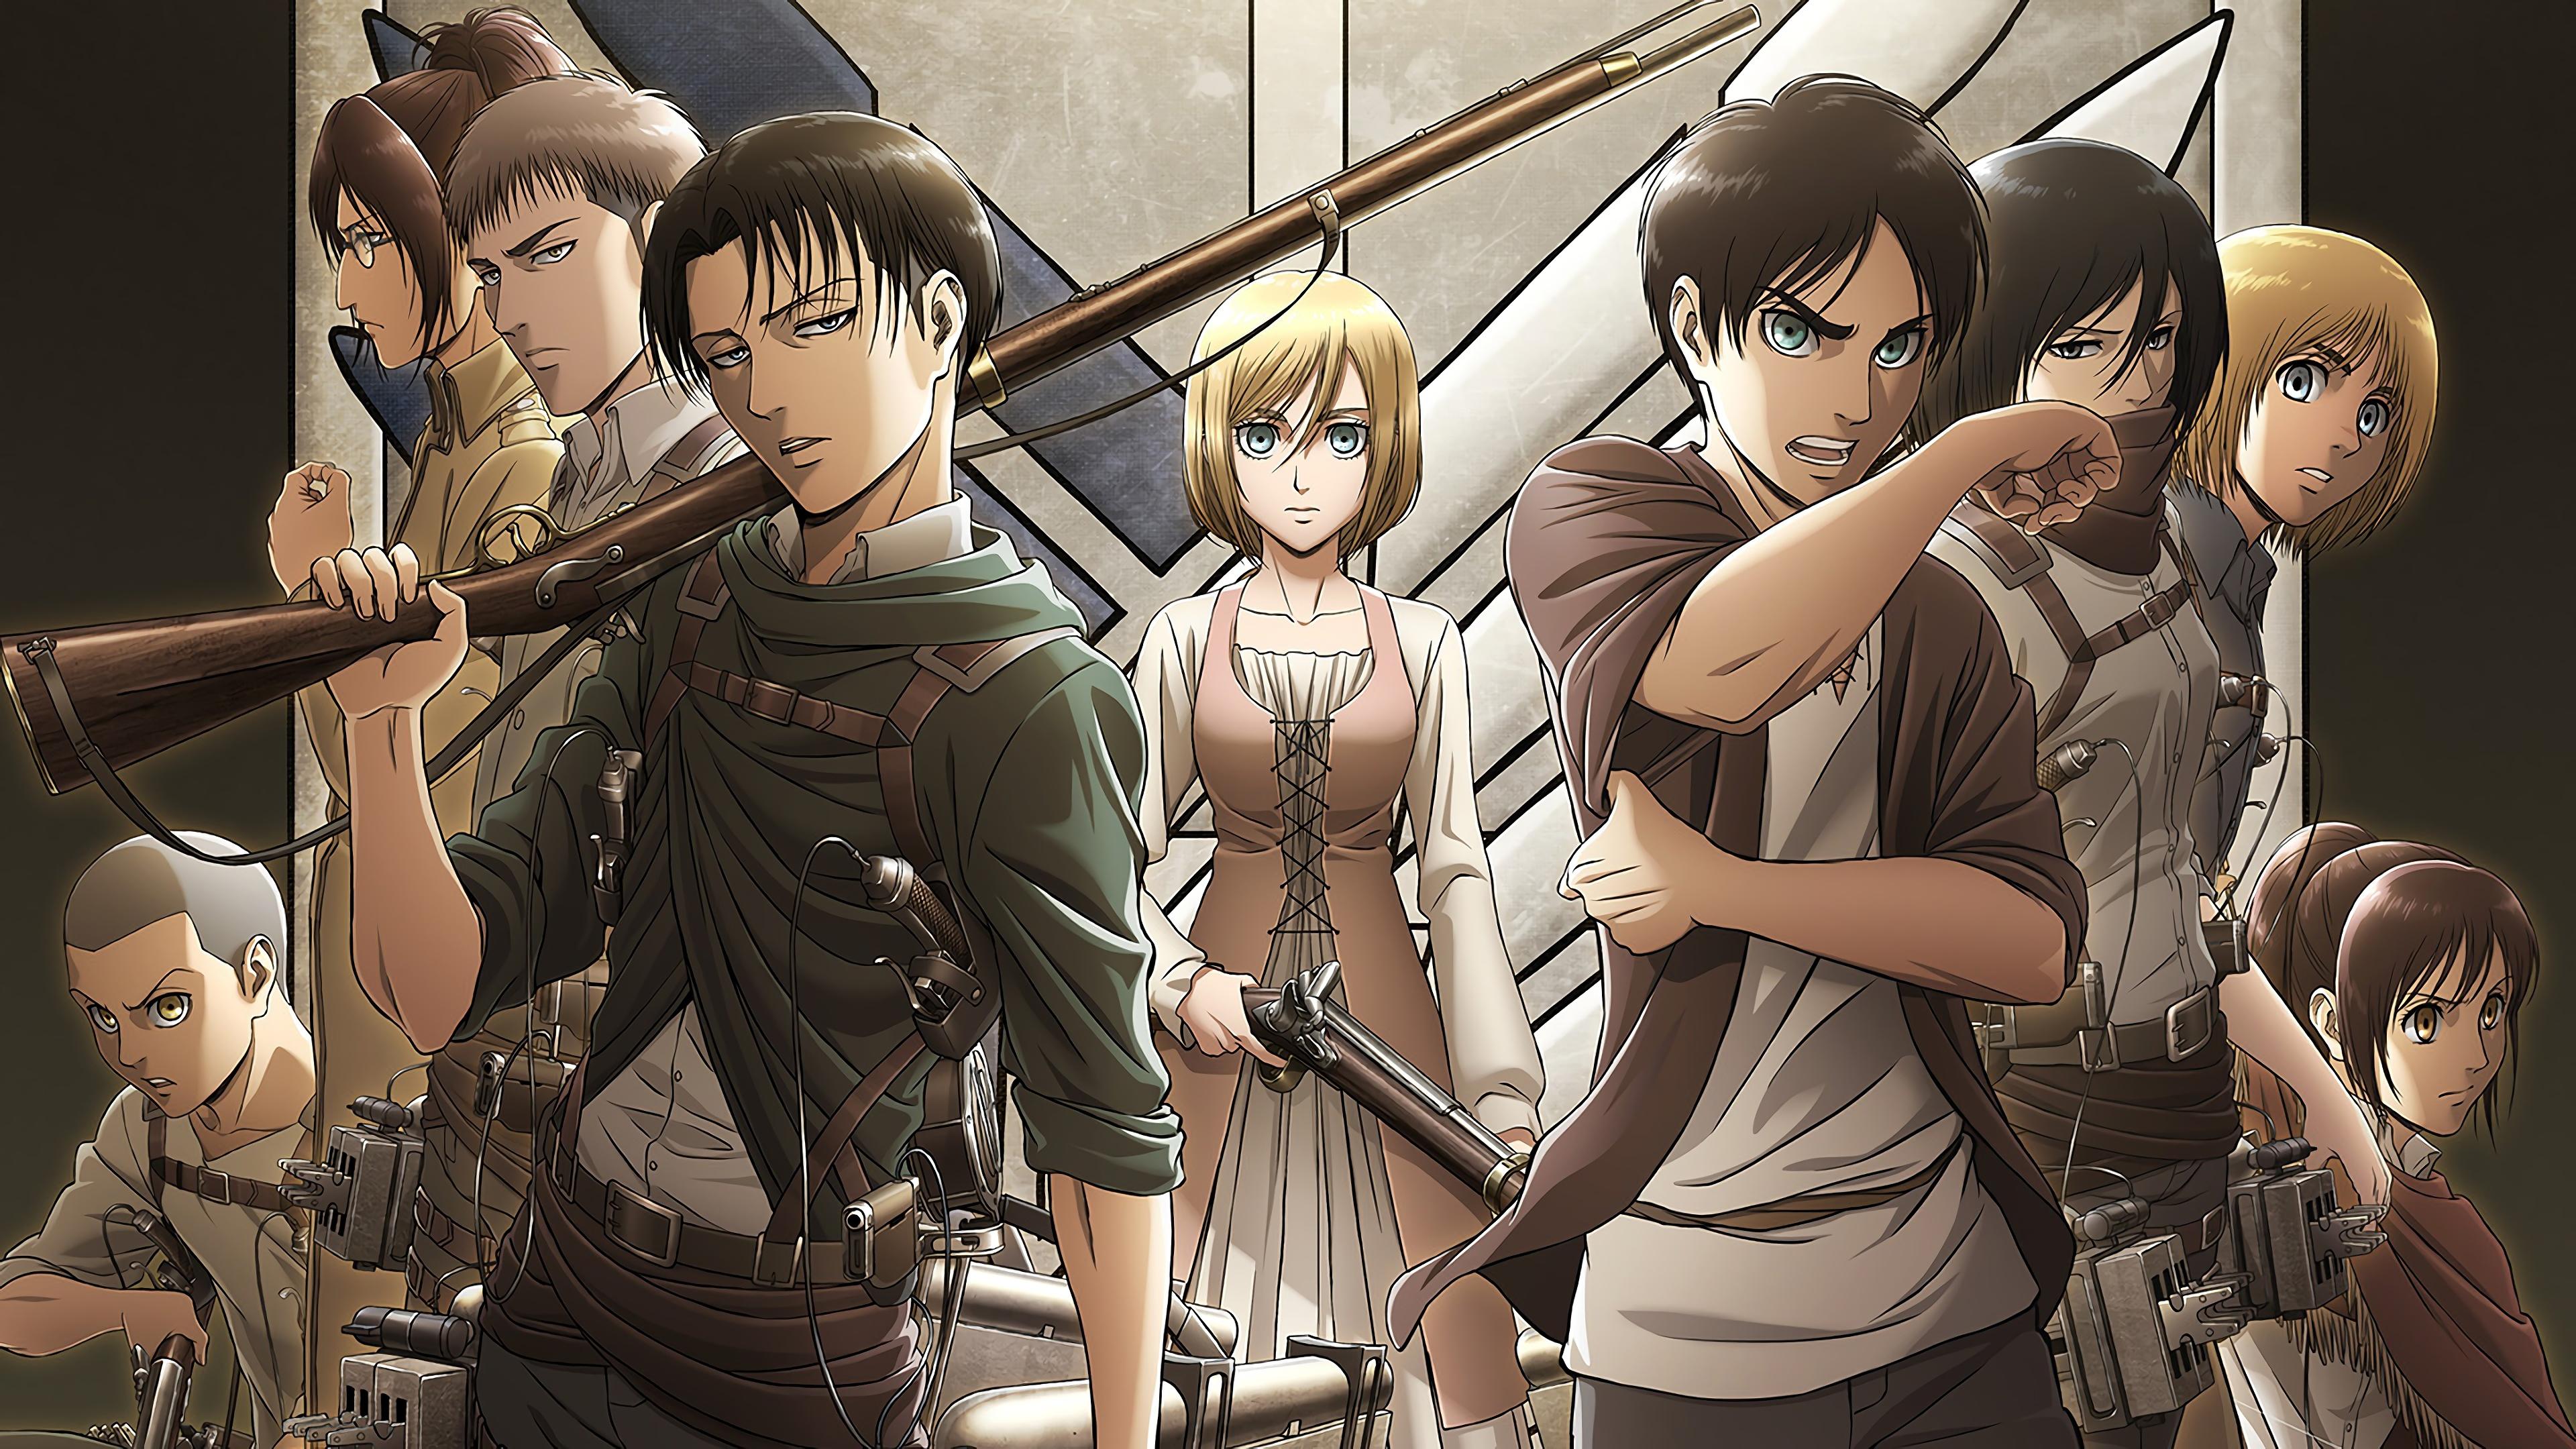 Attack on titan wallpaper eren mikasa armin levi. Levi, Eren, Krista, Attack on Titan, Characters, 4K, #143 ...